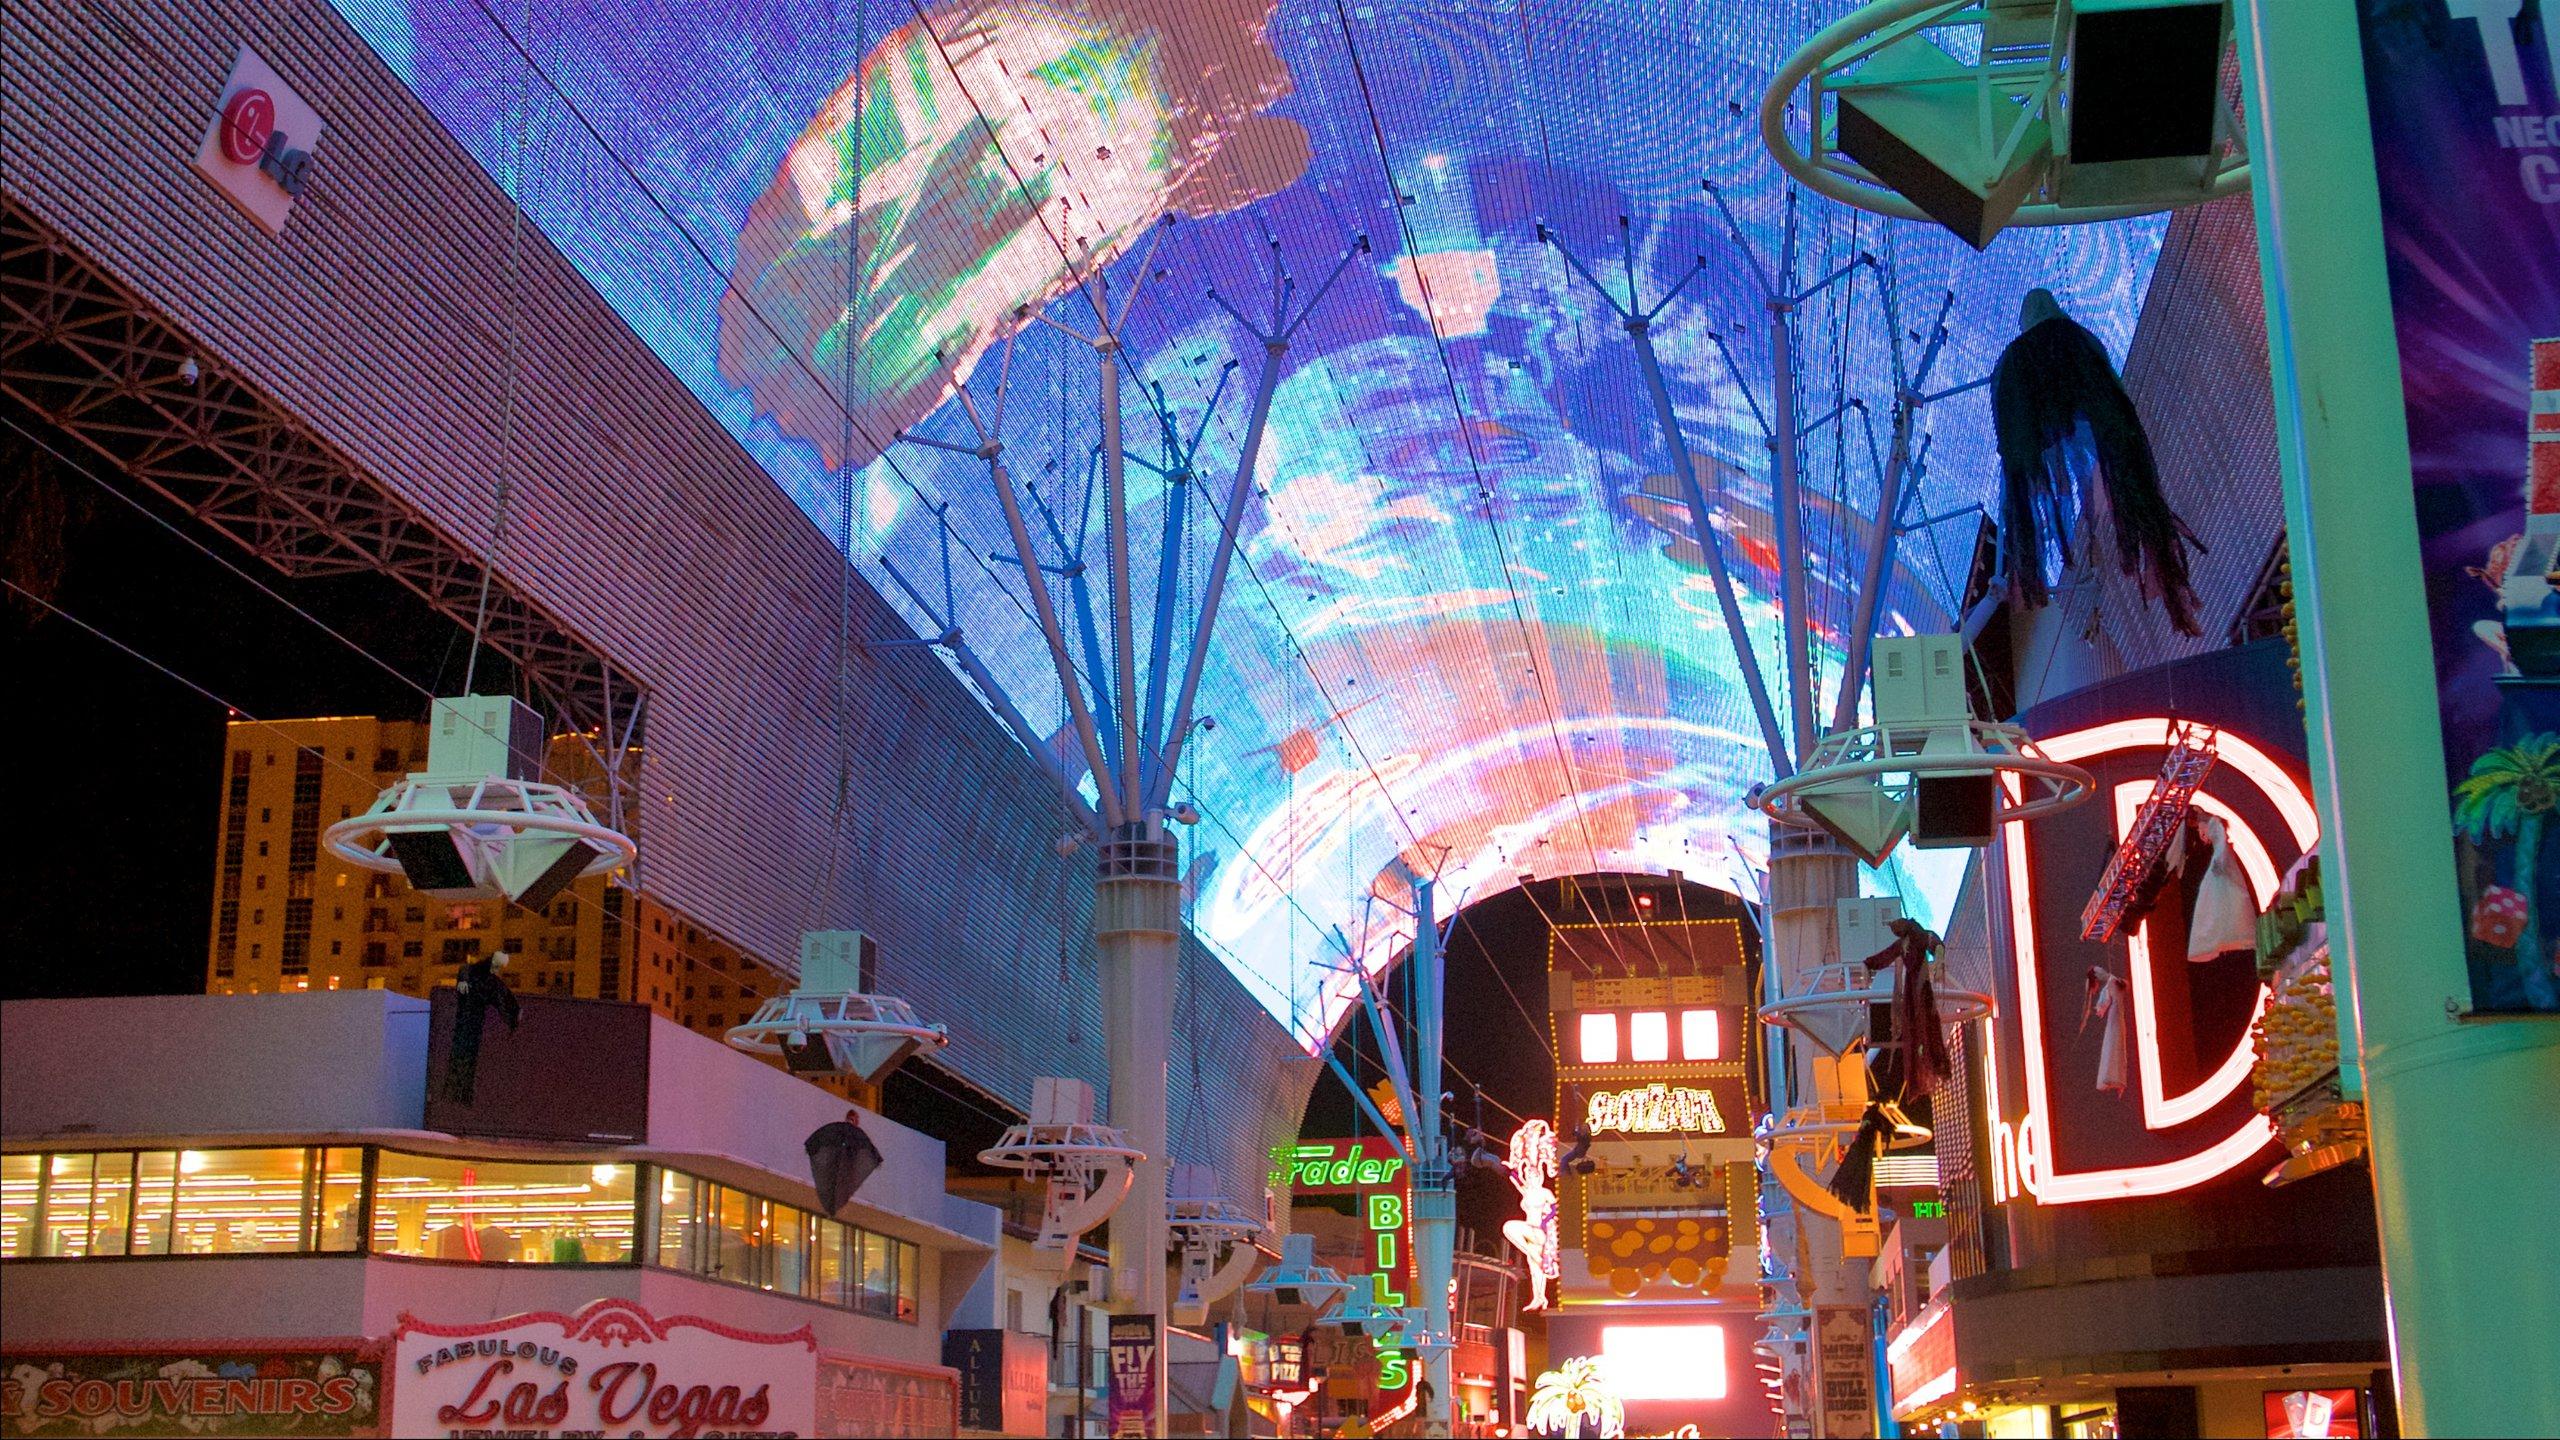 Fremont Street Experience, Las Vegas, Nevada, United States of America